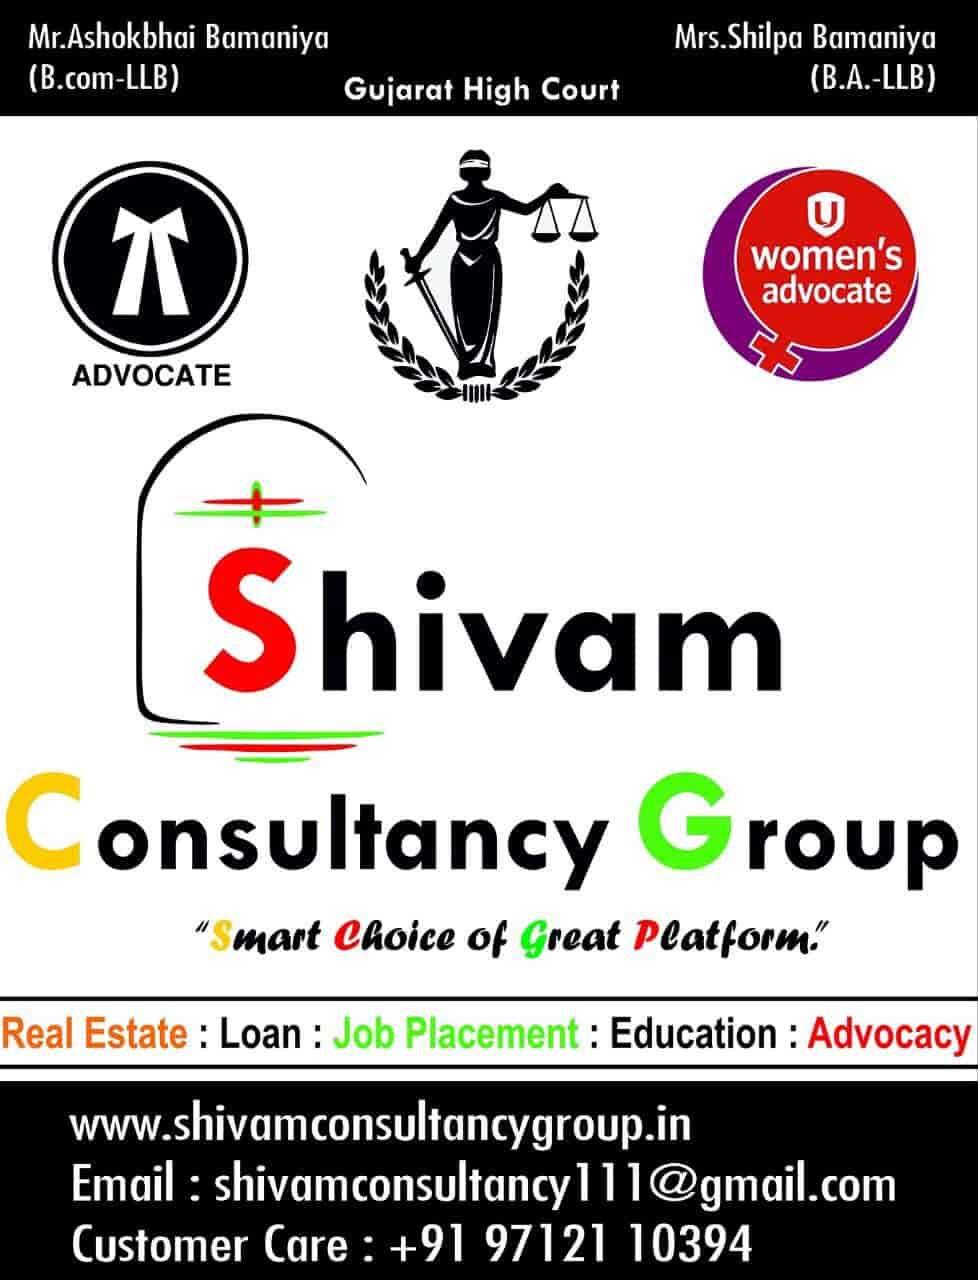 Shivam Estate Group, Swaminarayan Chowk - Estate Agents in